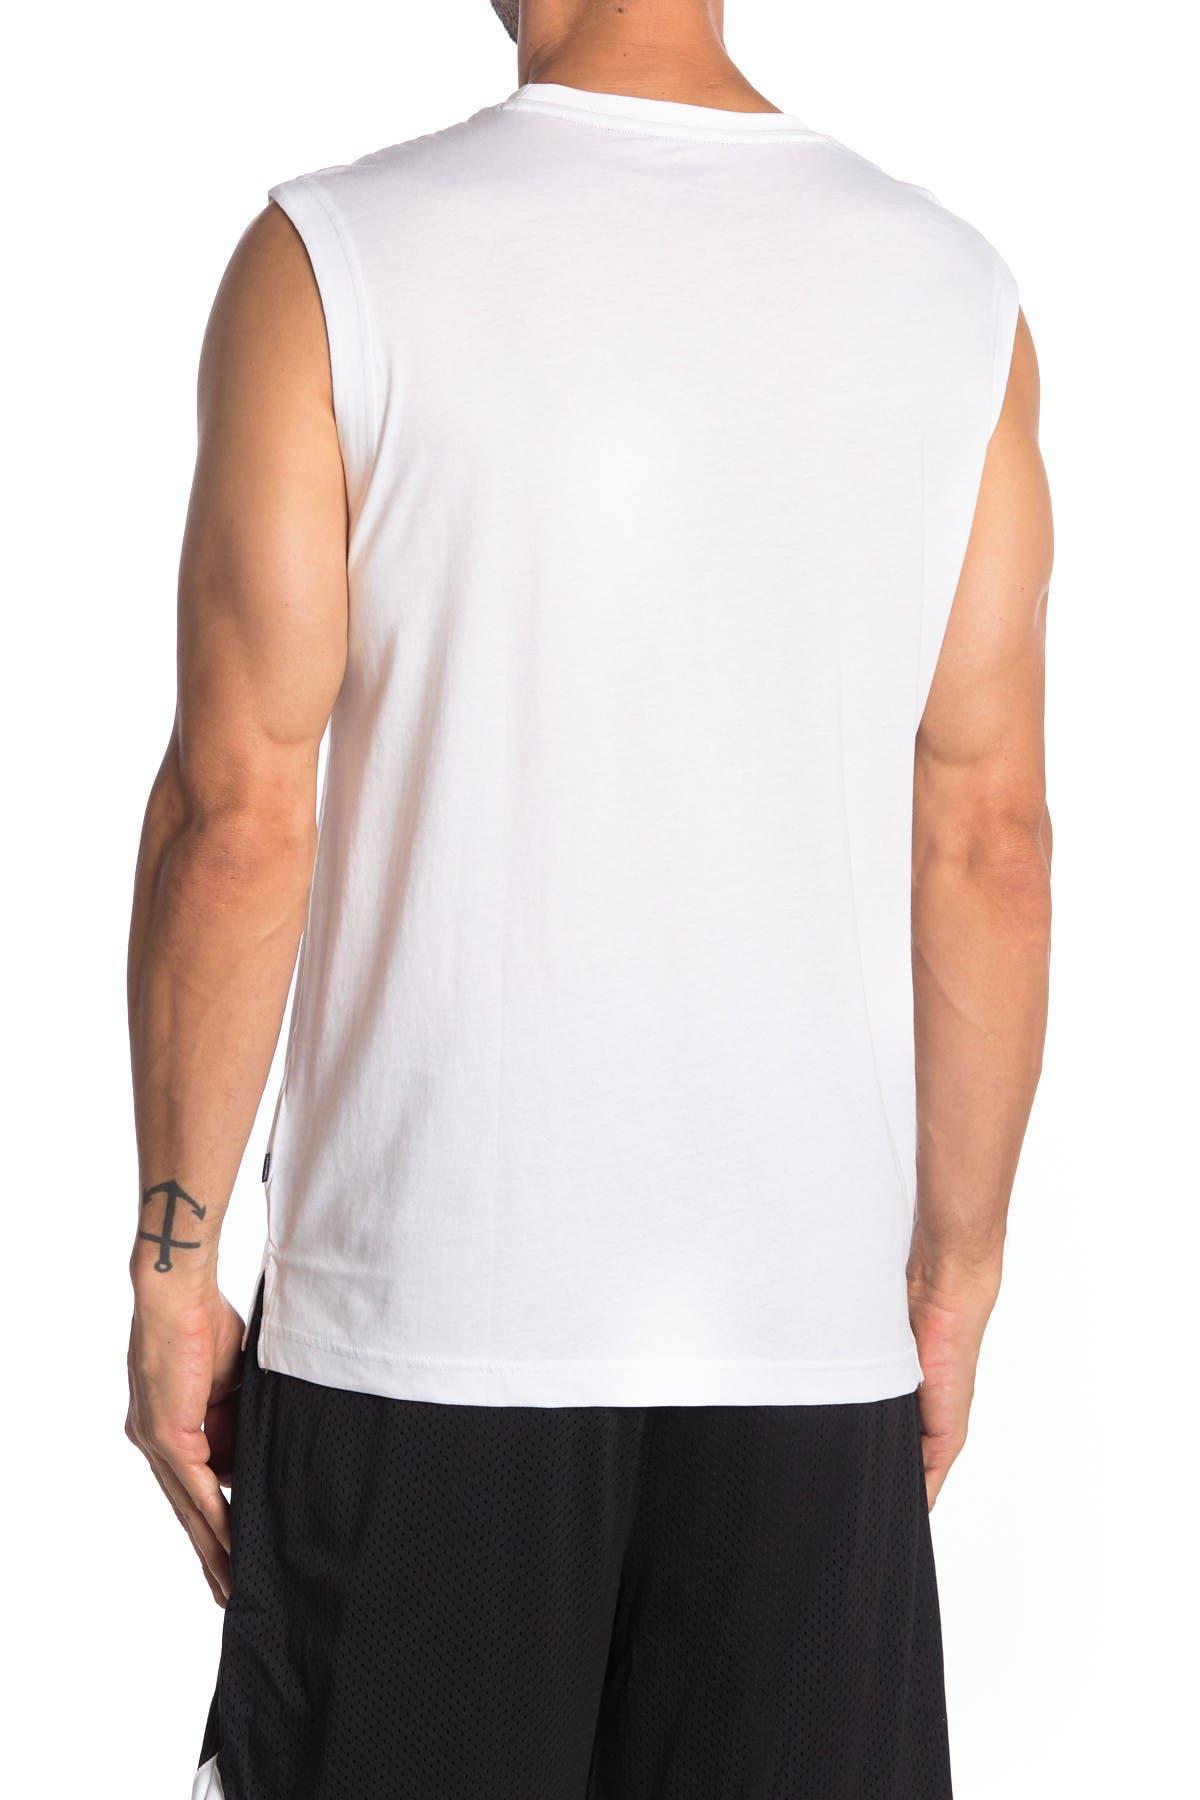 Image of PUMA ESS+ Sleeveless Shirt